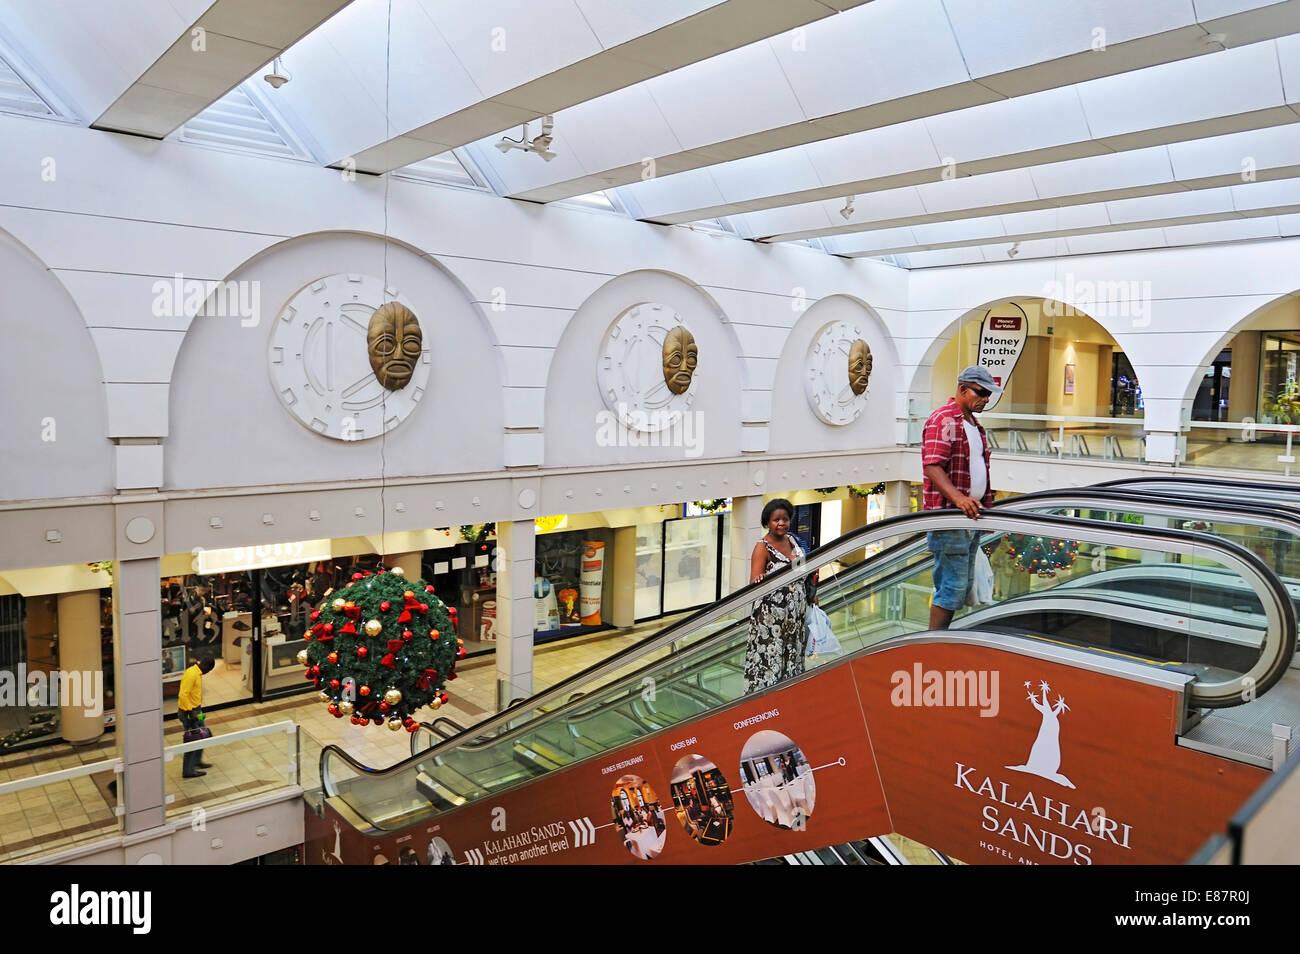 Shopping centre, Windhoek, Namibia - Stock Image